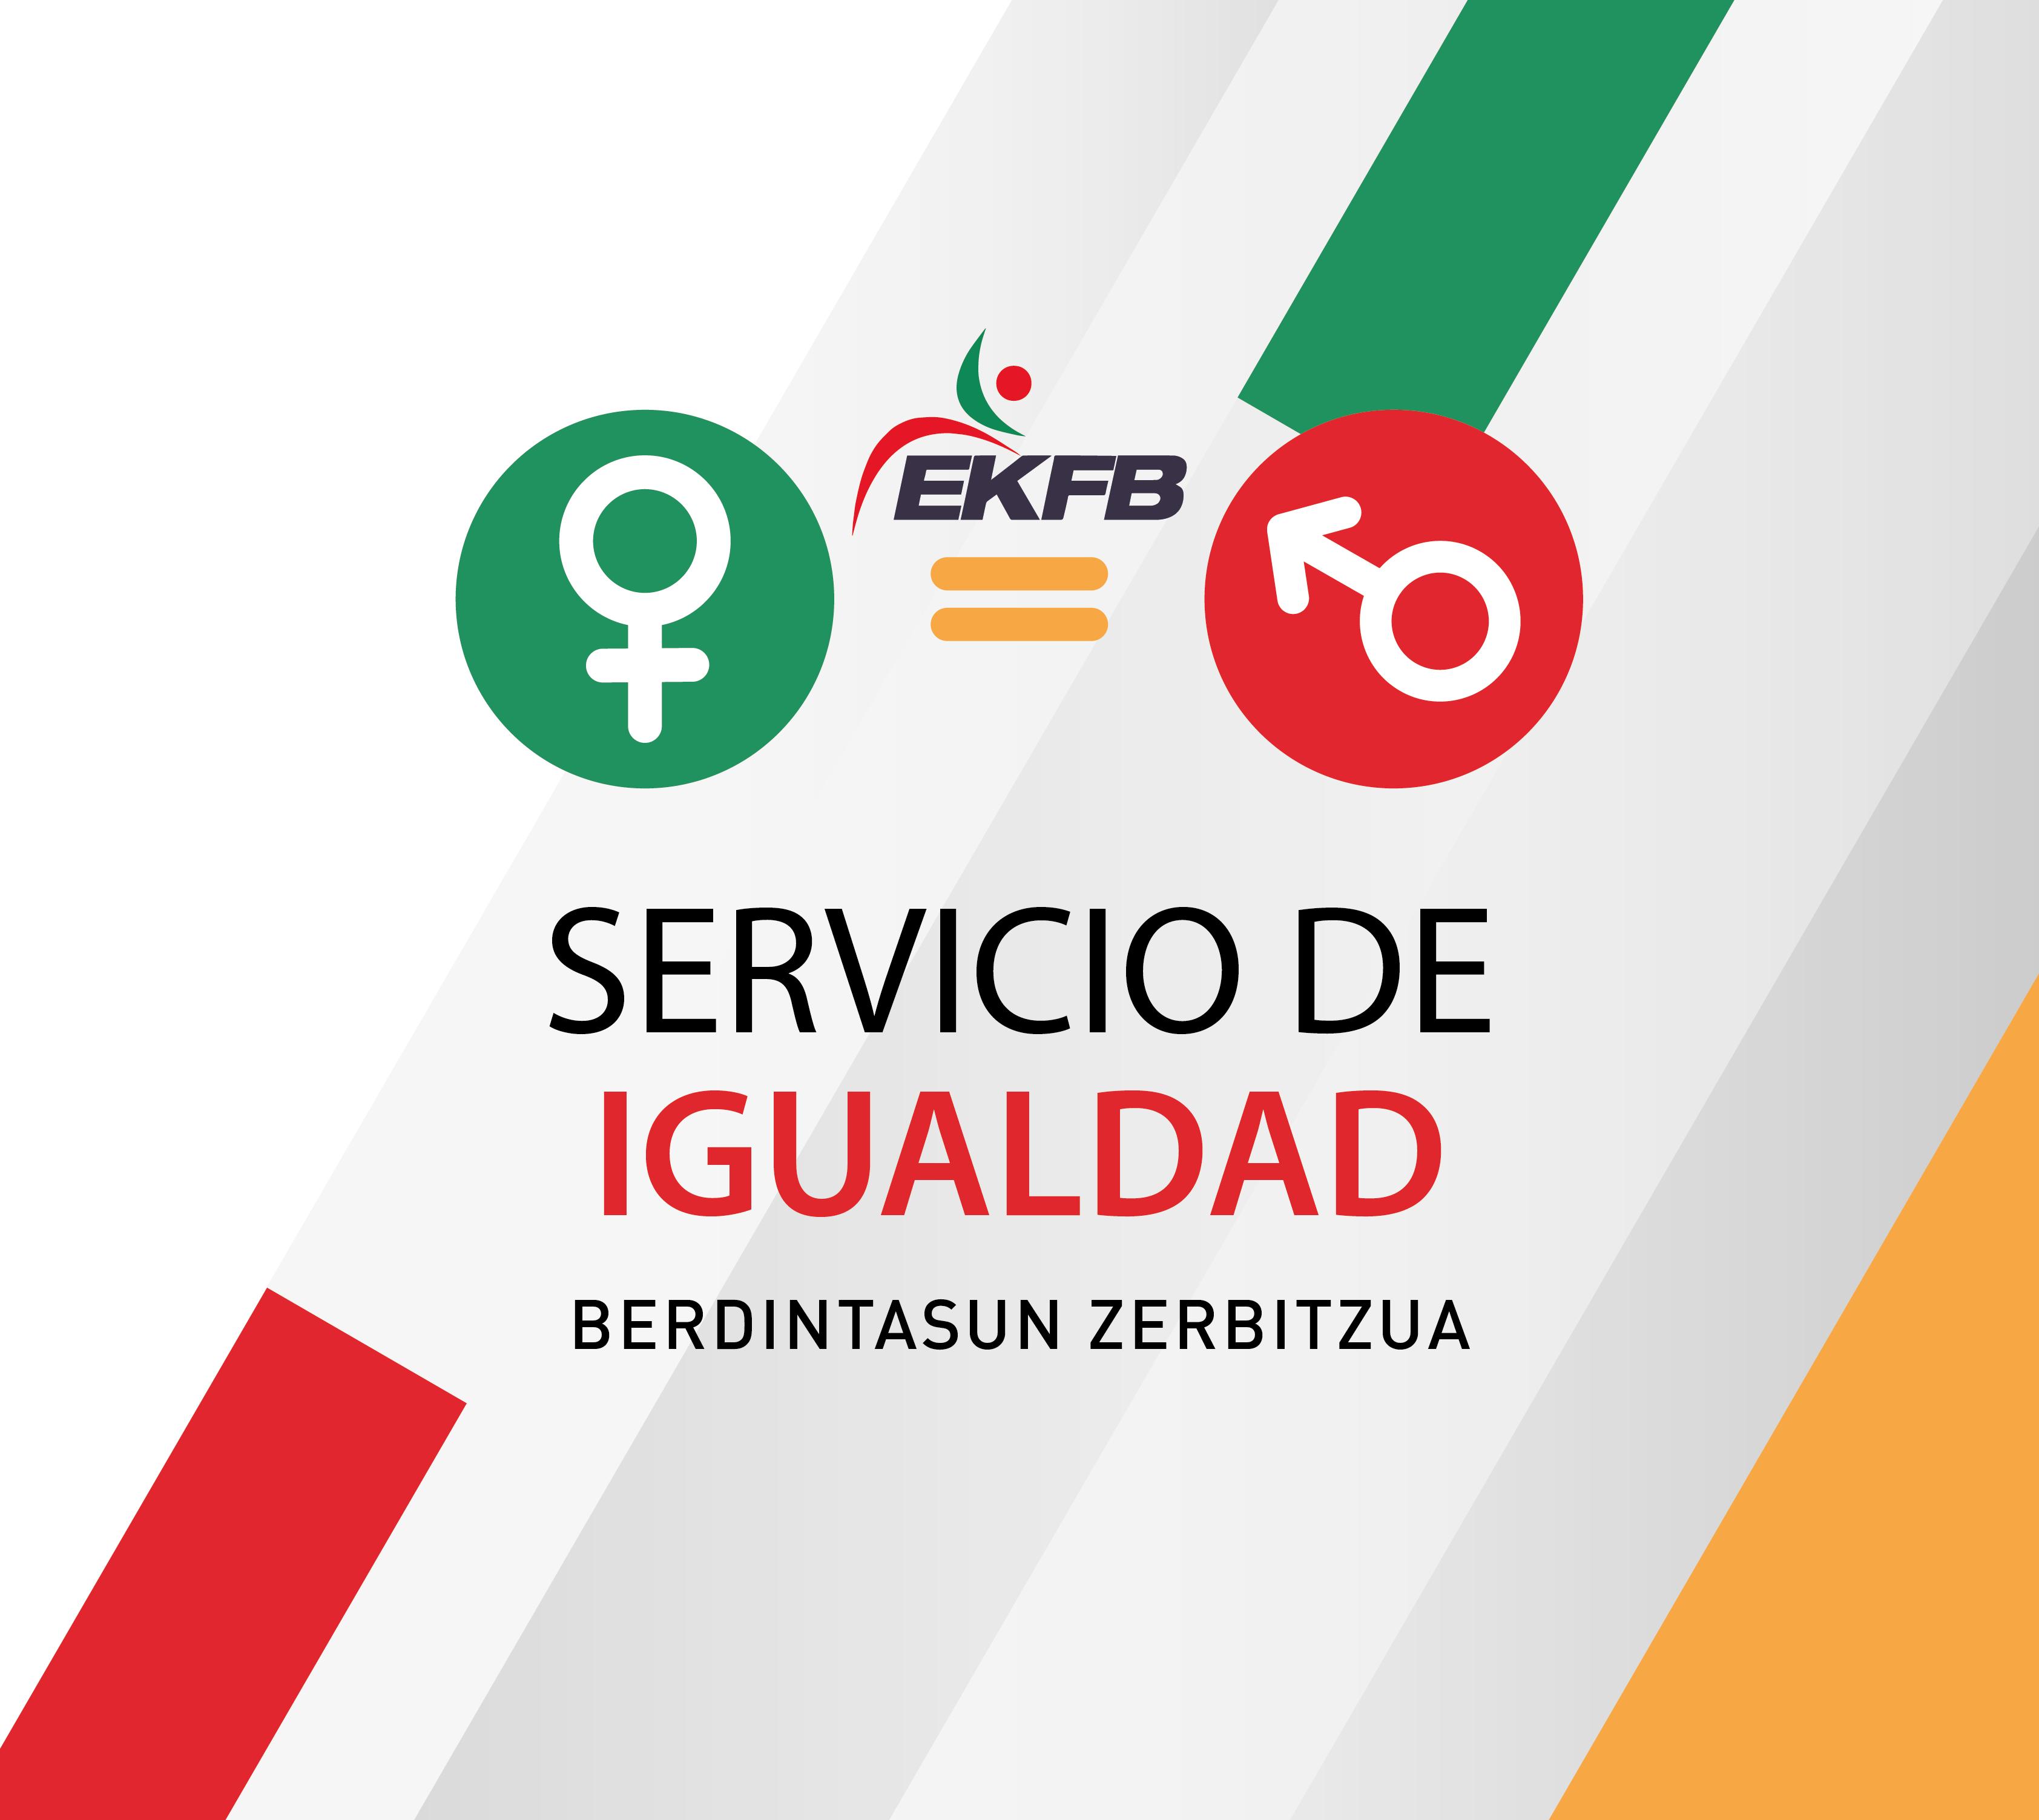 Centro Autorizado Enseñanzas Deportivas